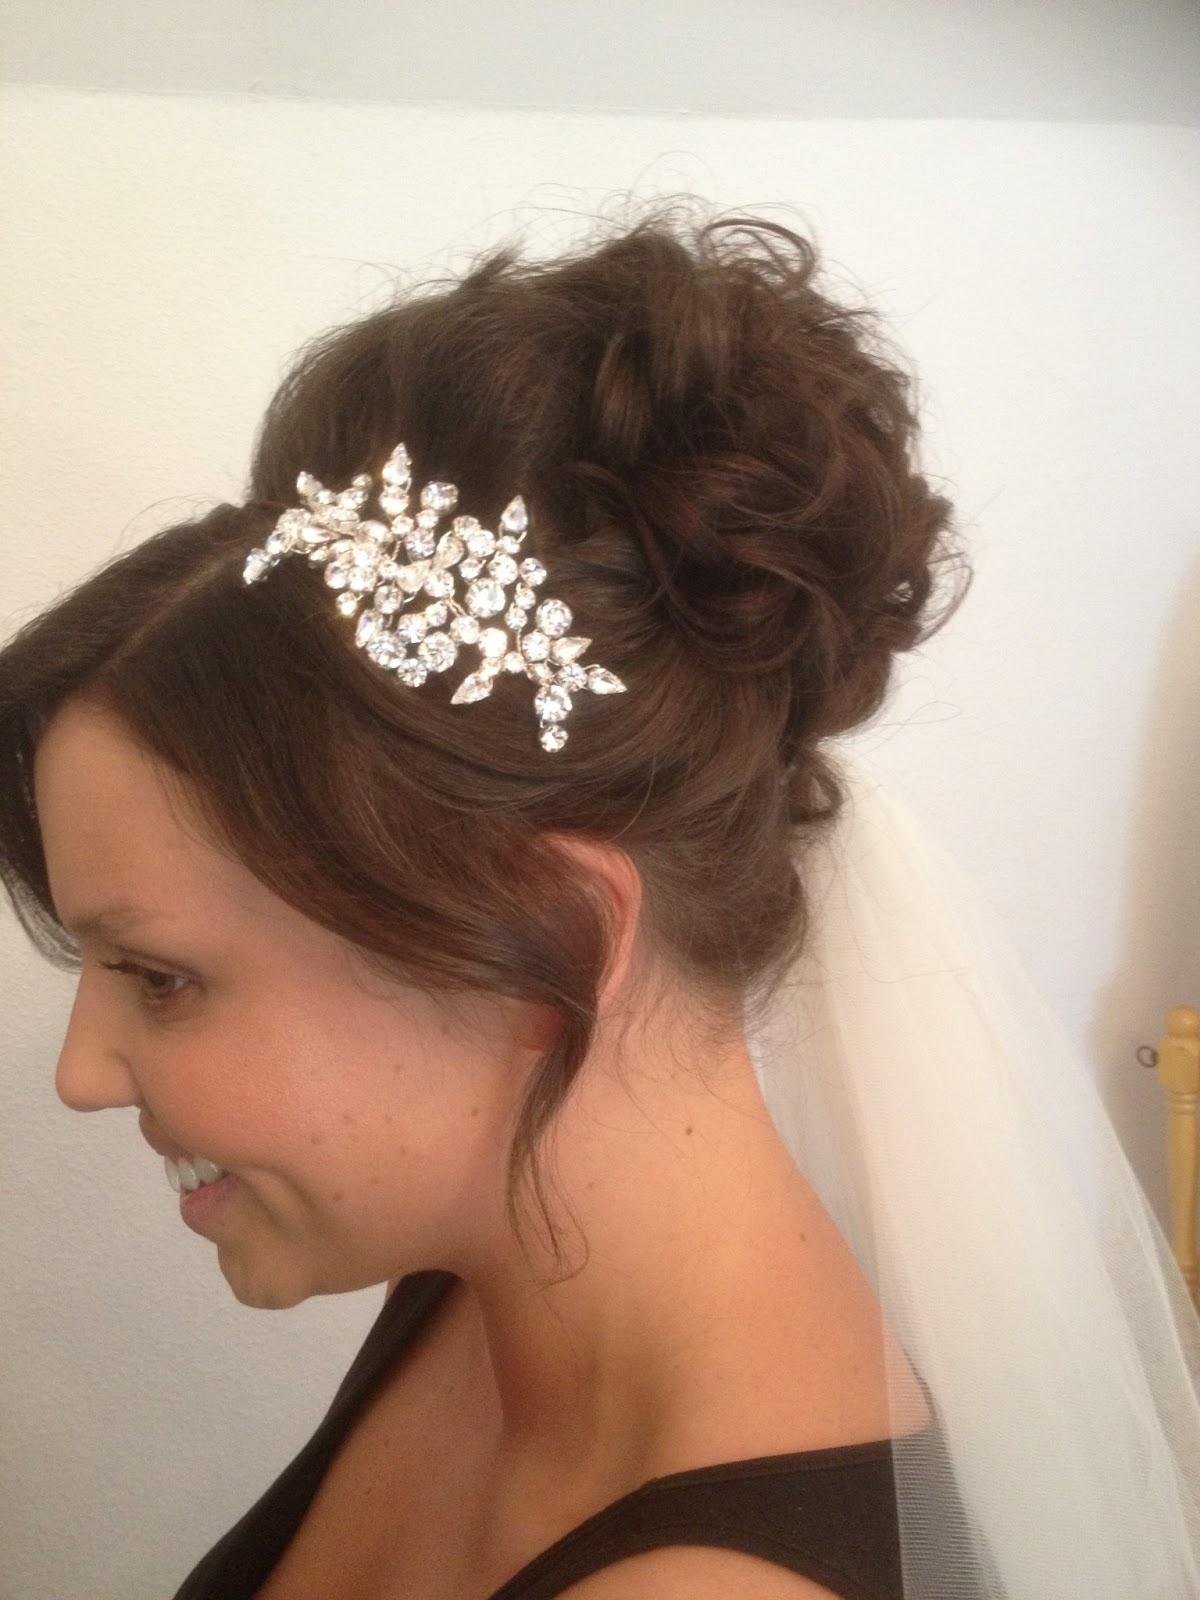 fordham hair design  wedding bridal hair specialist: april 2013